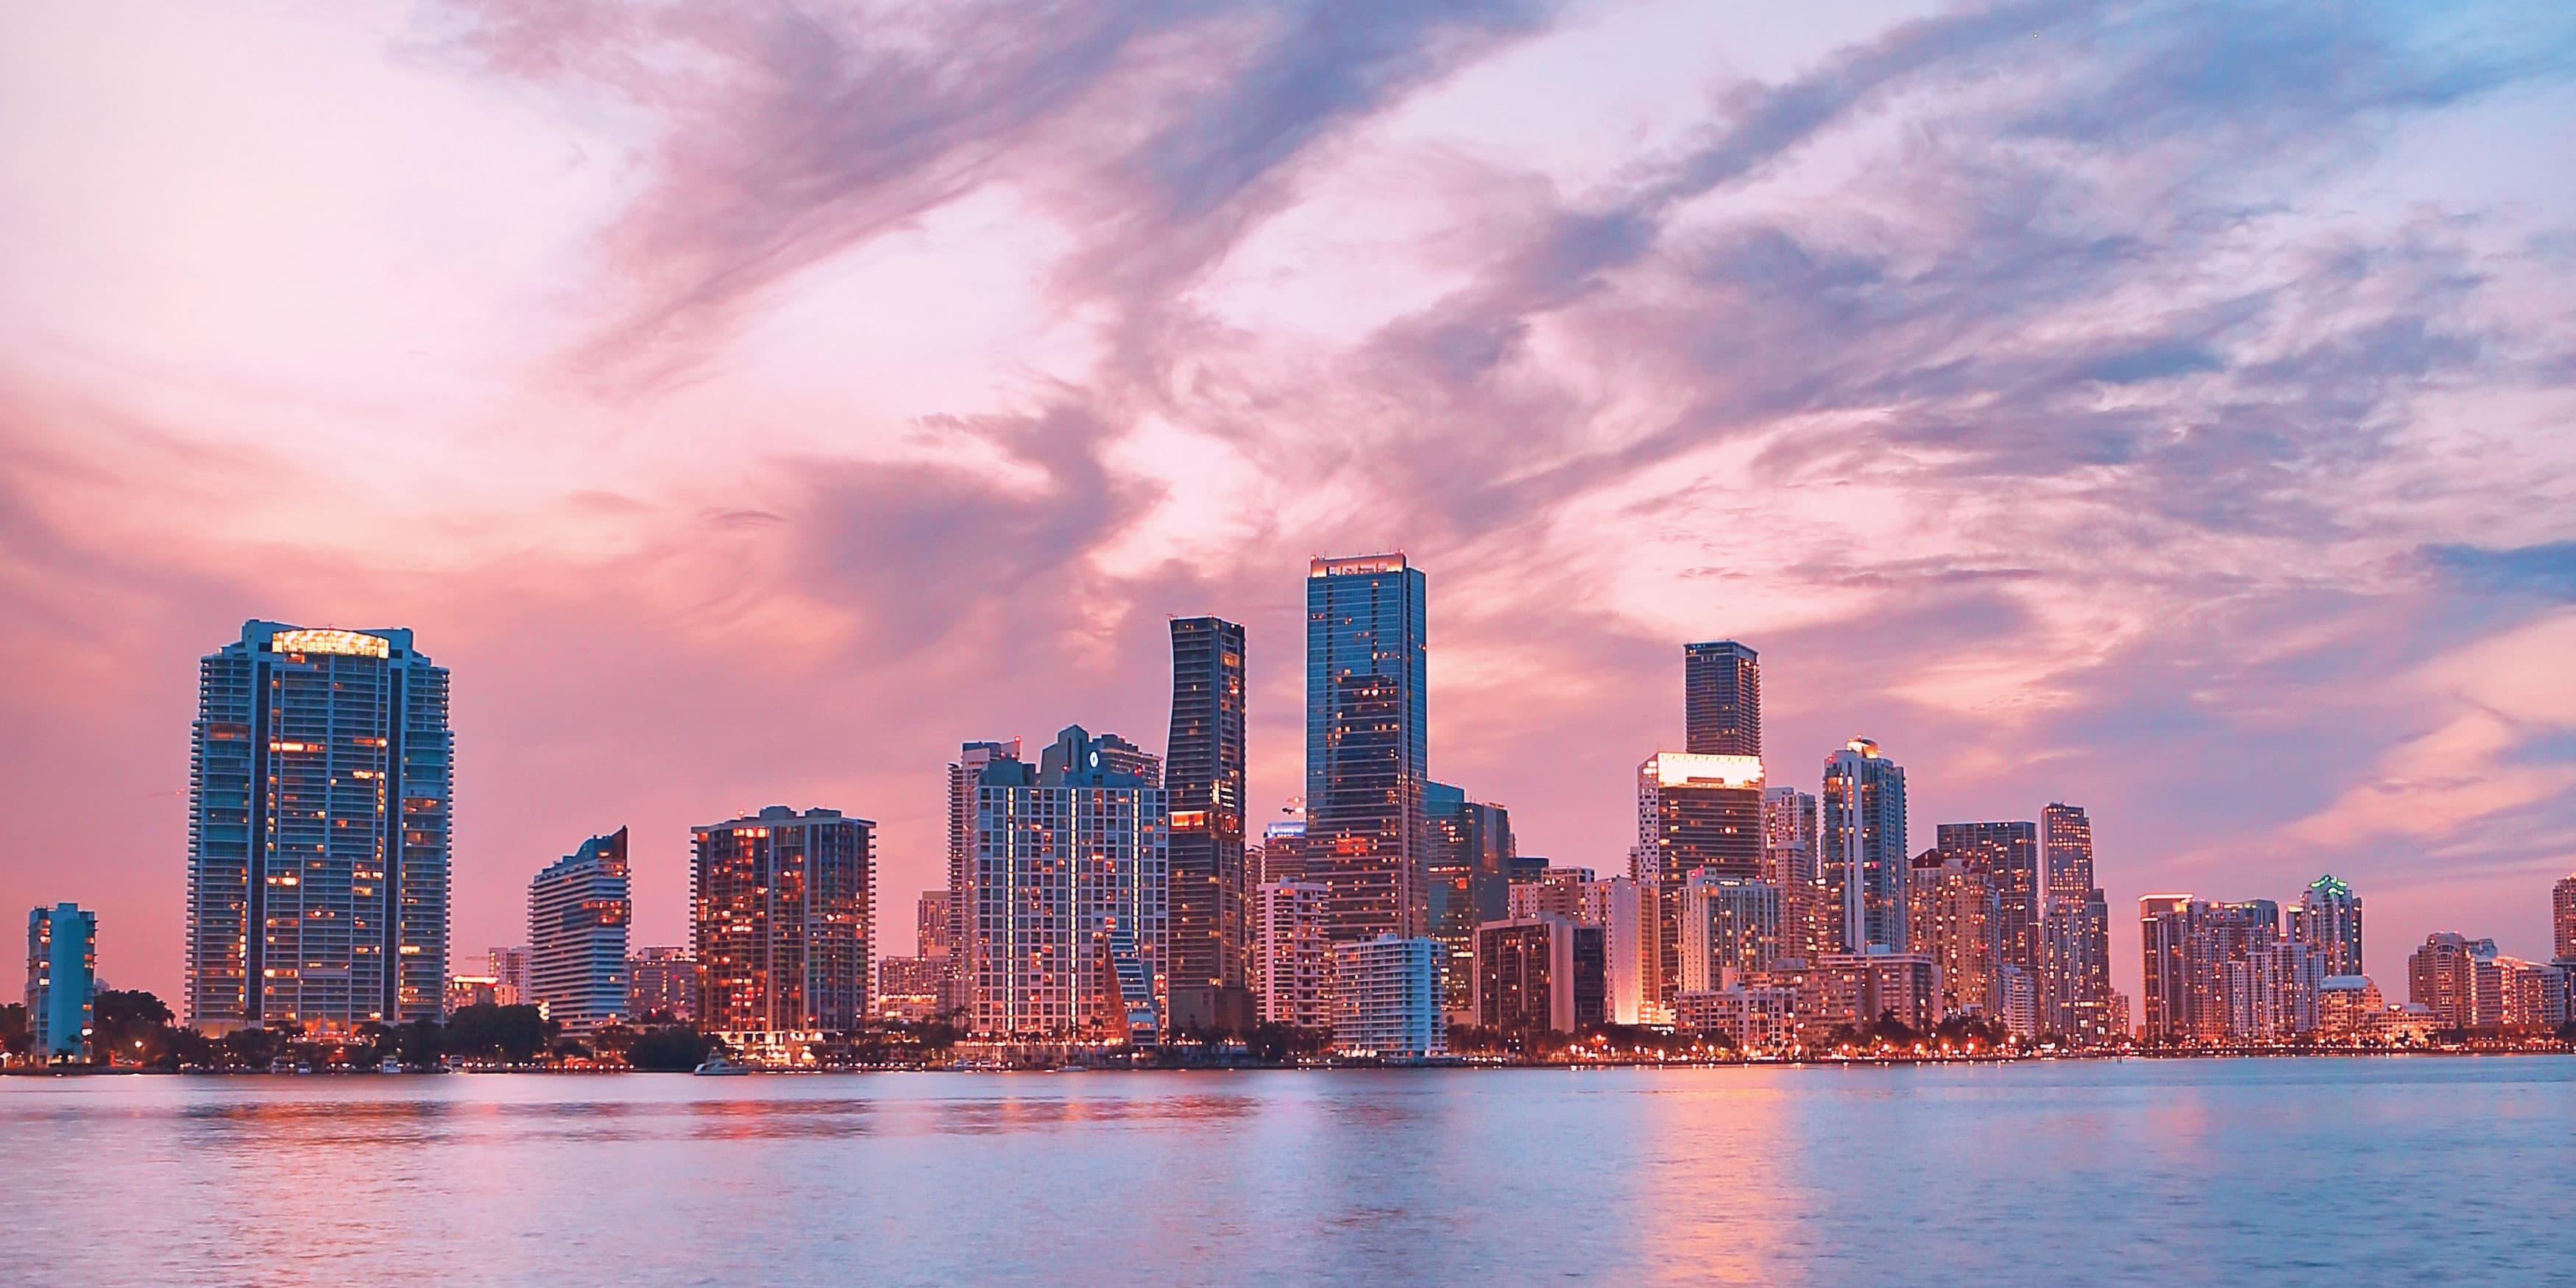 Miami, Florda Skyline with Pastel Skies